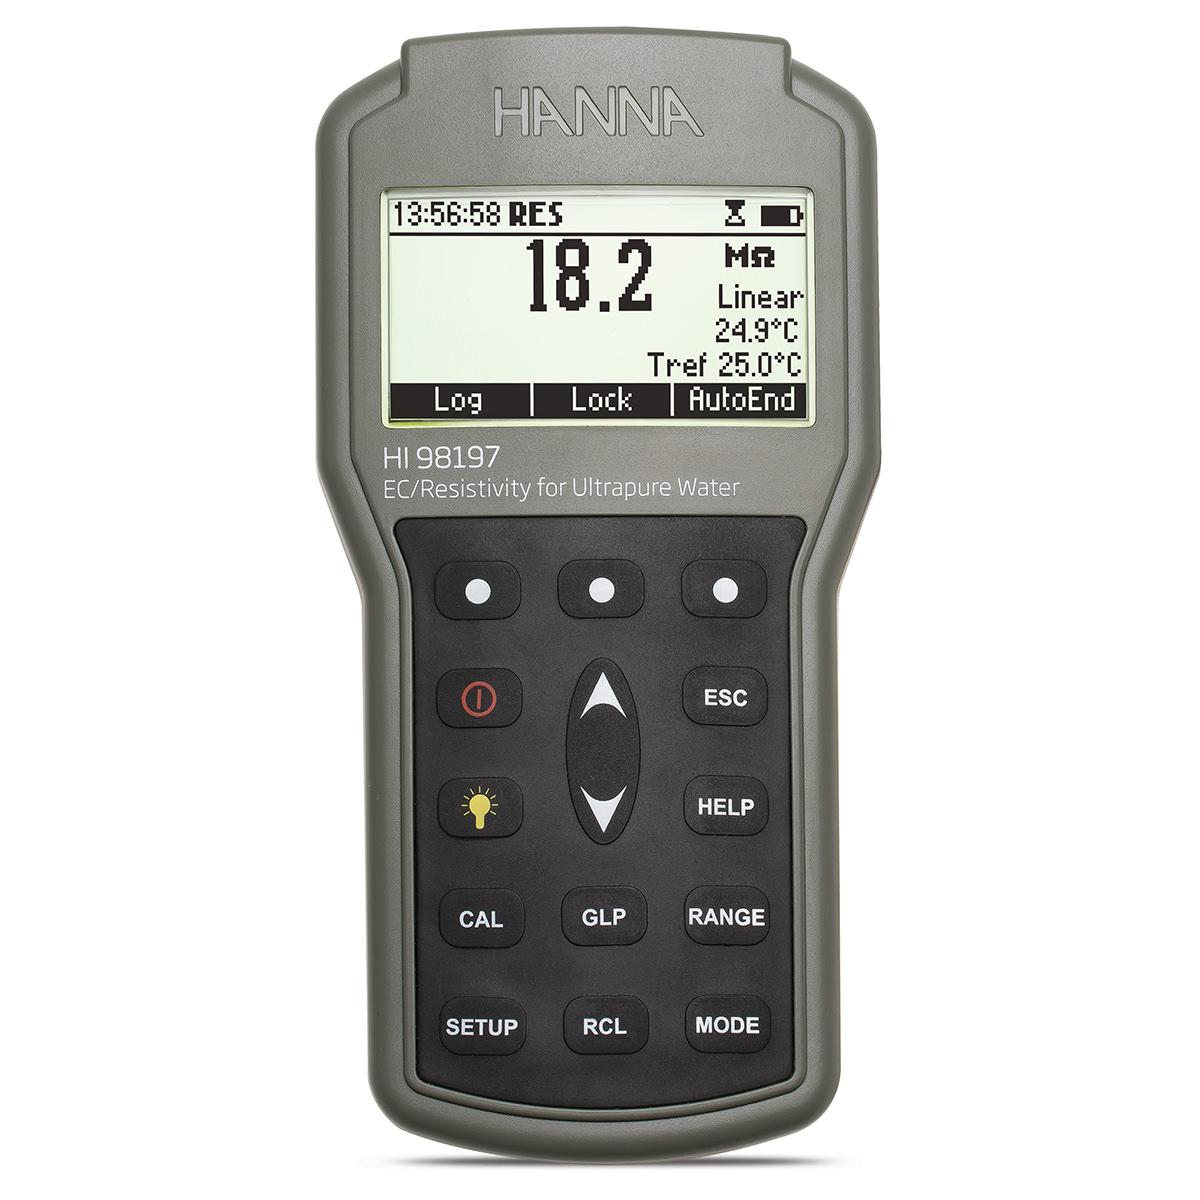 HI98197 Ultra Pure Water Waterproof Portable Meter